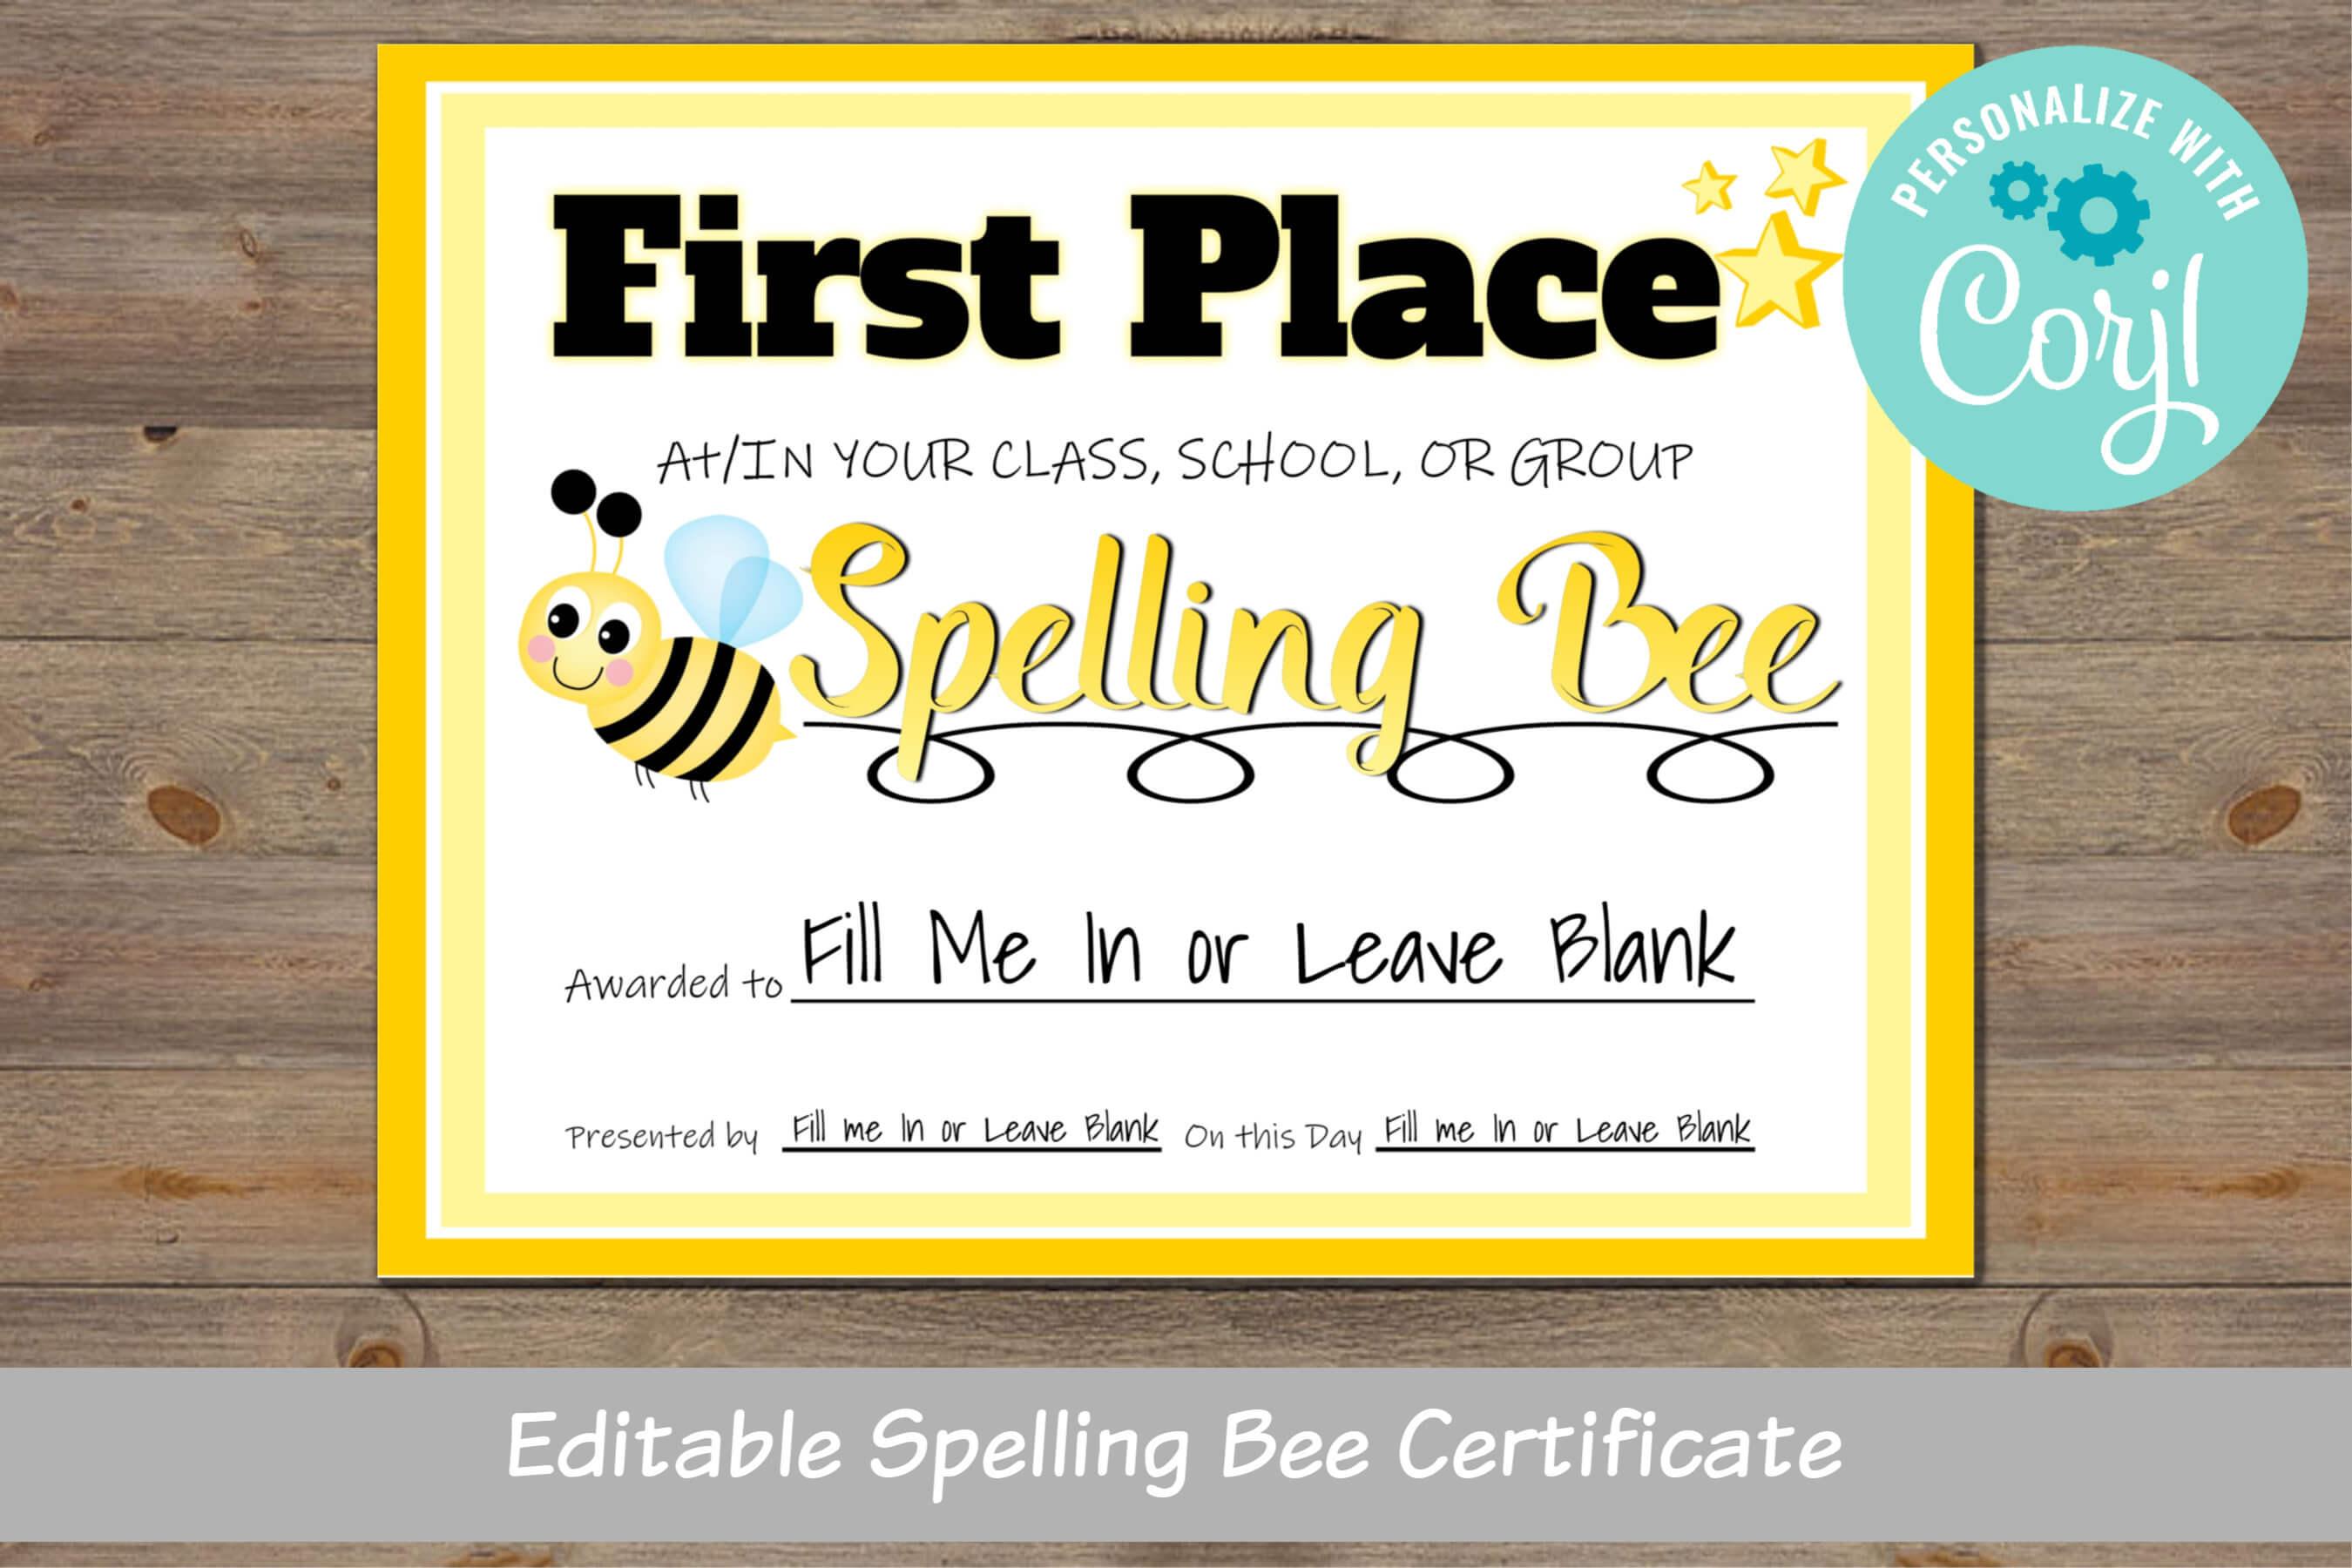 Spelling Bee Award Certificate, For School, For Classroom, For District Regarding Spelling Bee Award Certificate Template